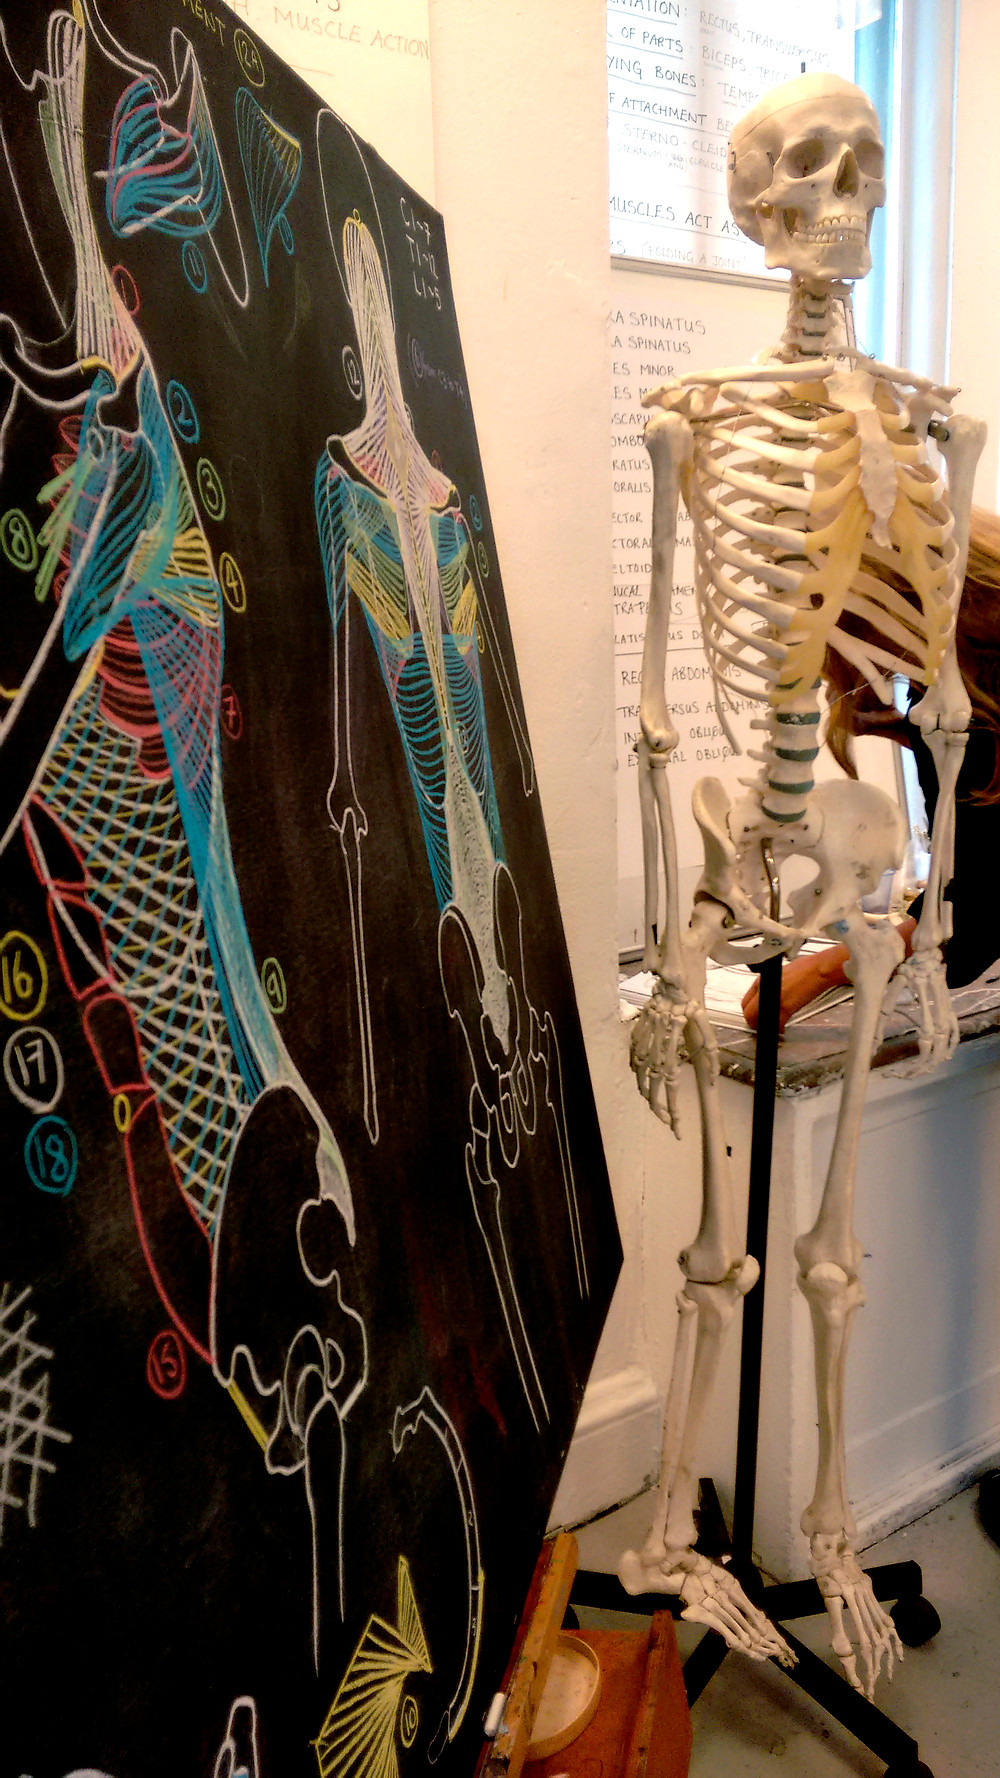 Anatomical illustration at the Ruskin